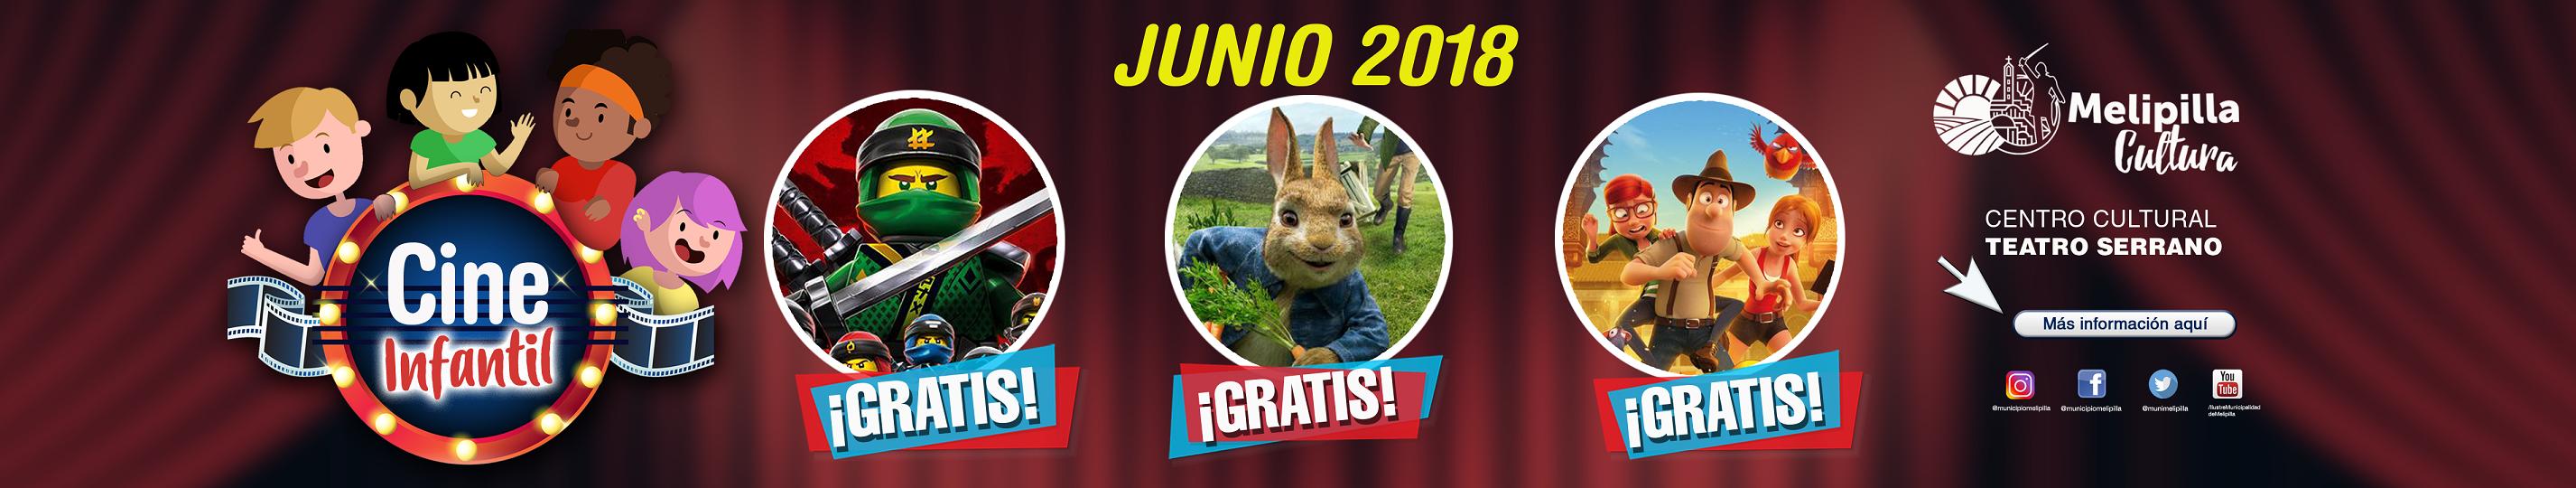 slider-CARTELERA-INFANTIL-CINE-JUNIO-2018